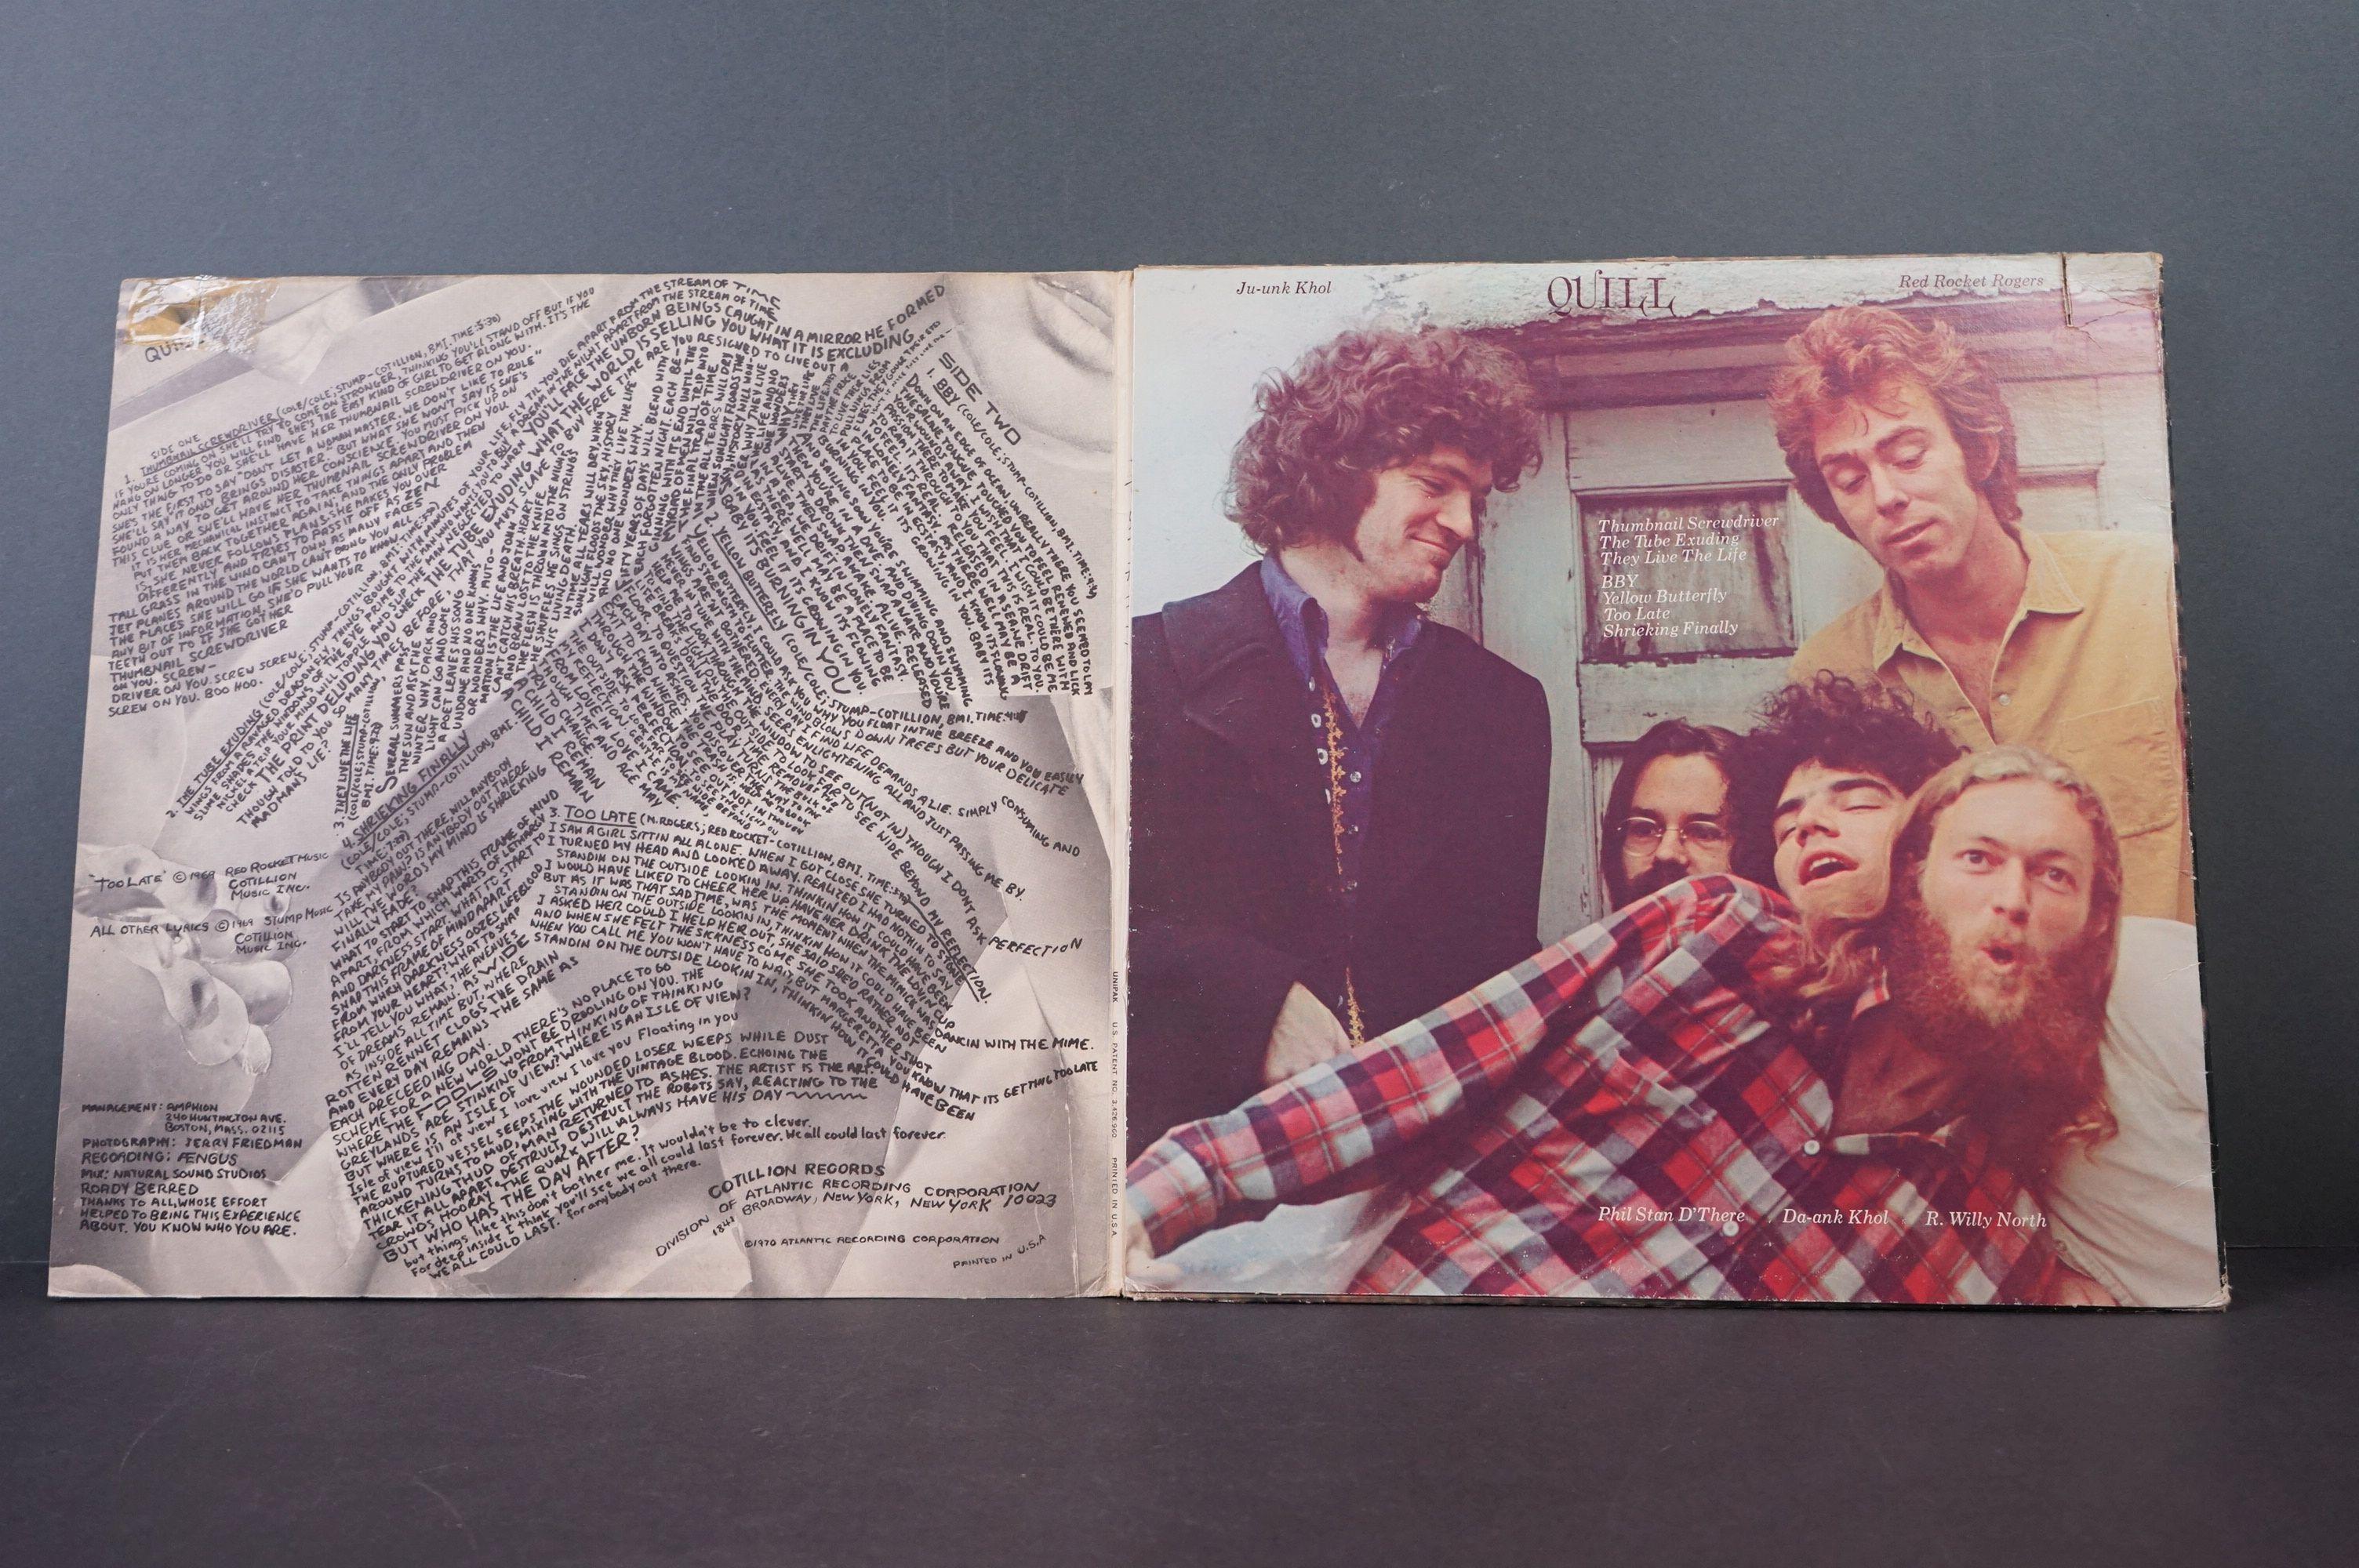 Vinyl - Psych - Three original Rare US pressing Psych albums. Maypole - Maypole (1971 US, Colossus - Image 8 of 8